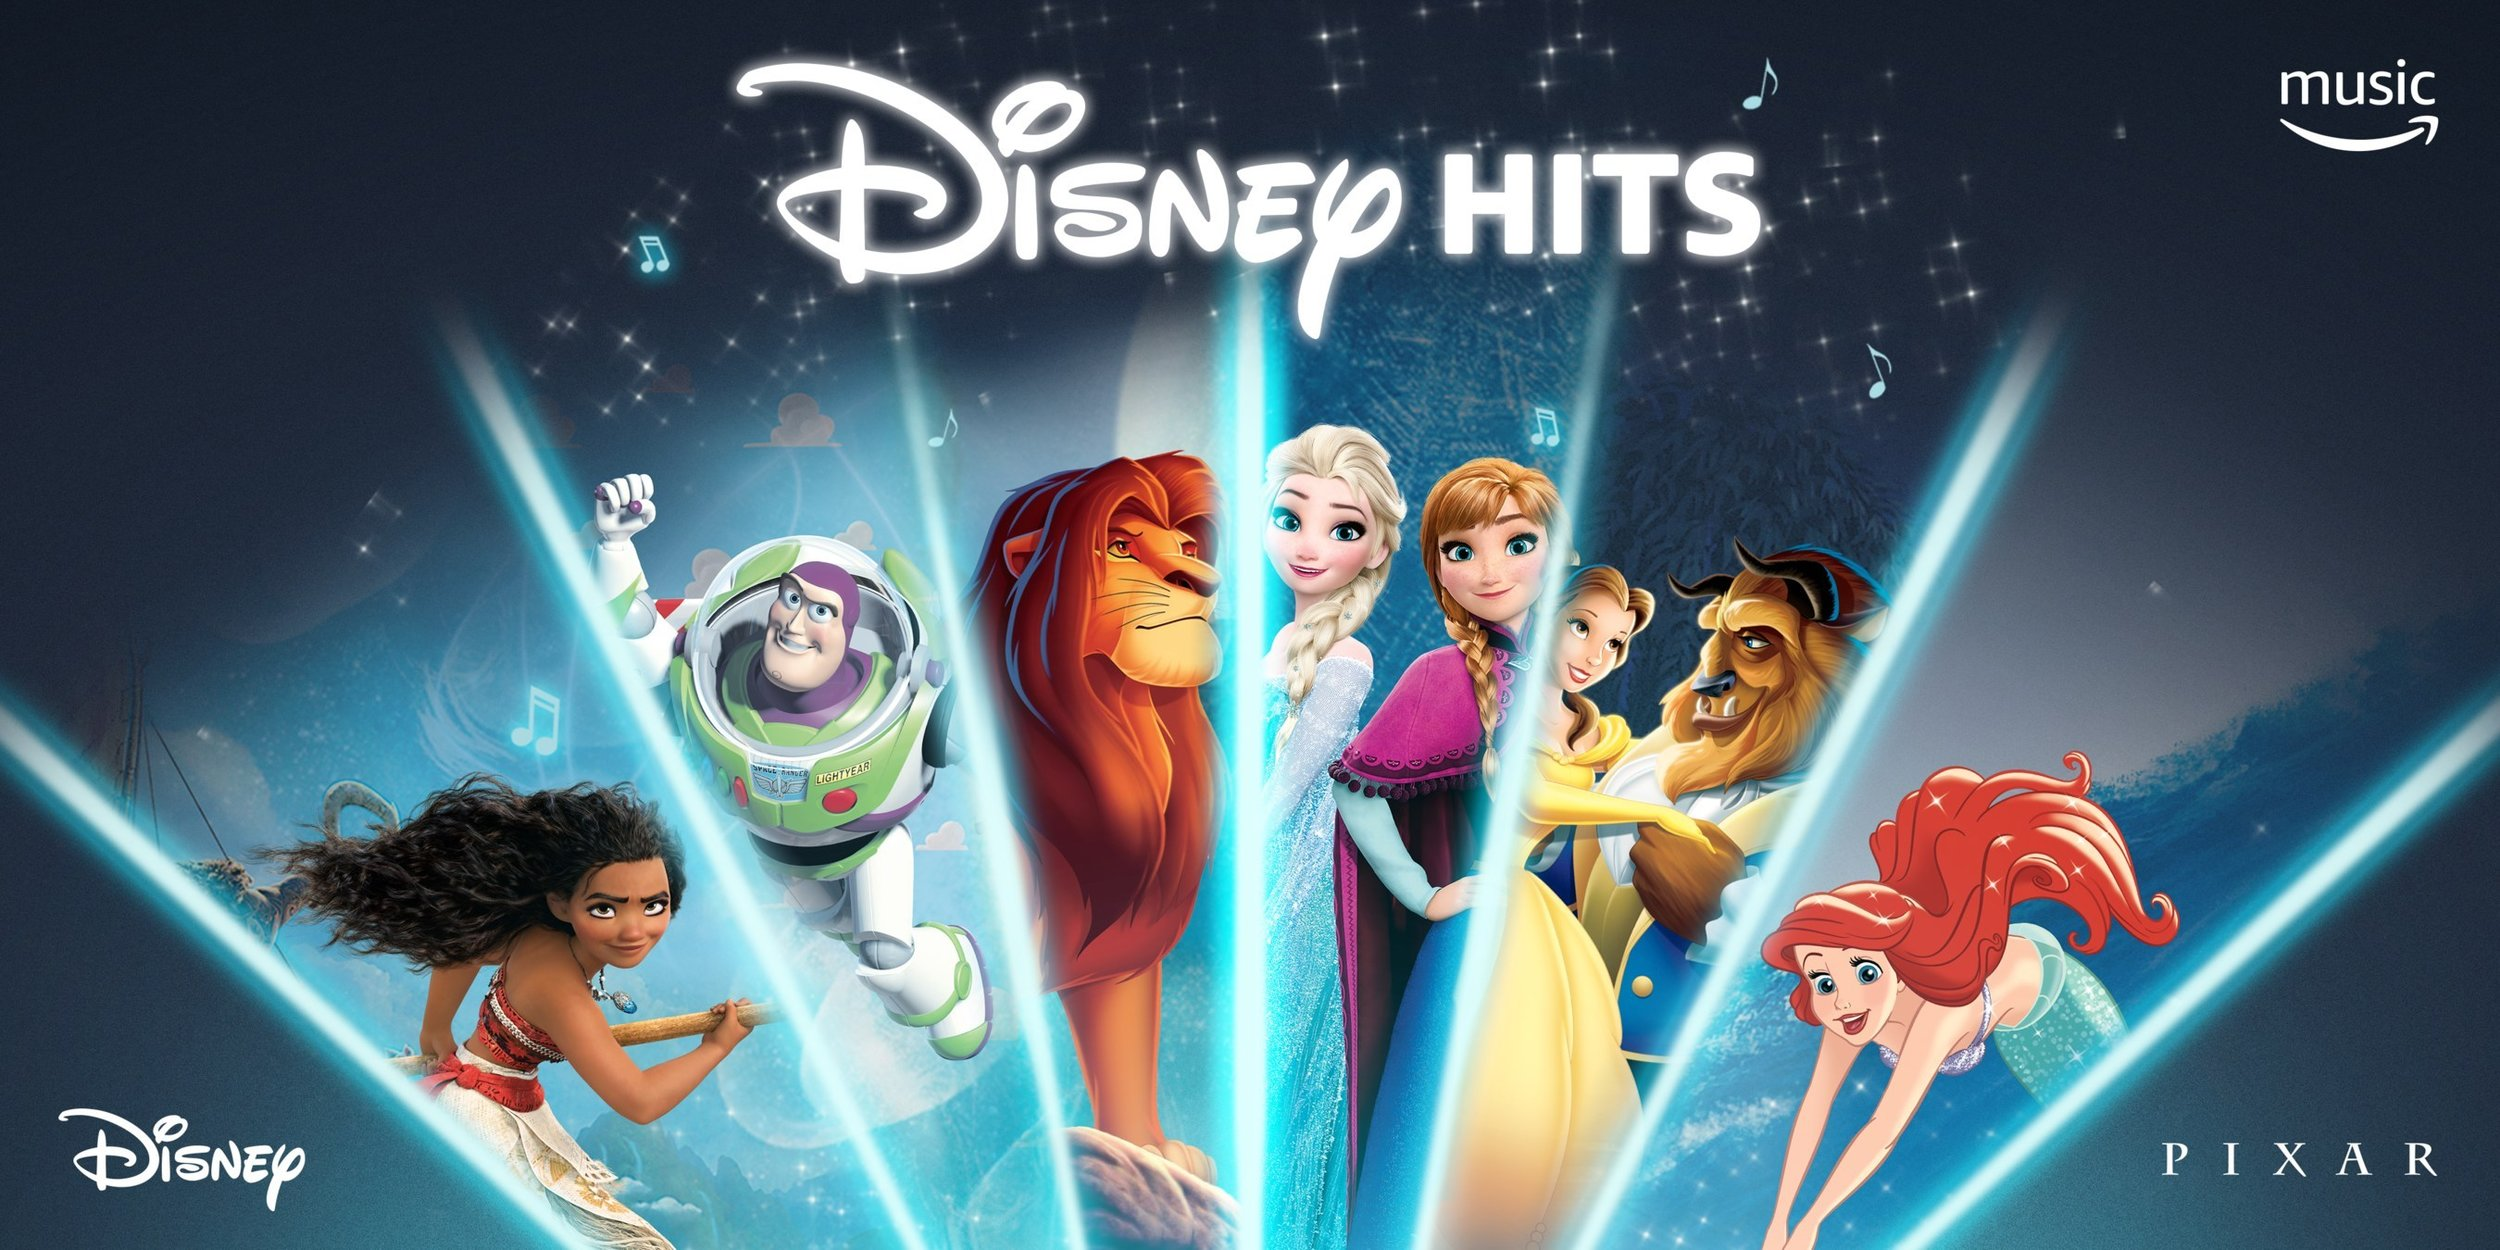 Disney_Hits_on_Amazon_Prime_Music_Disney_Music_Group.jpg